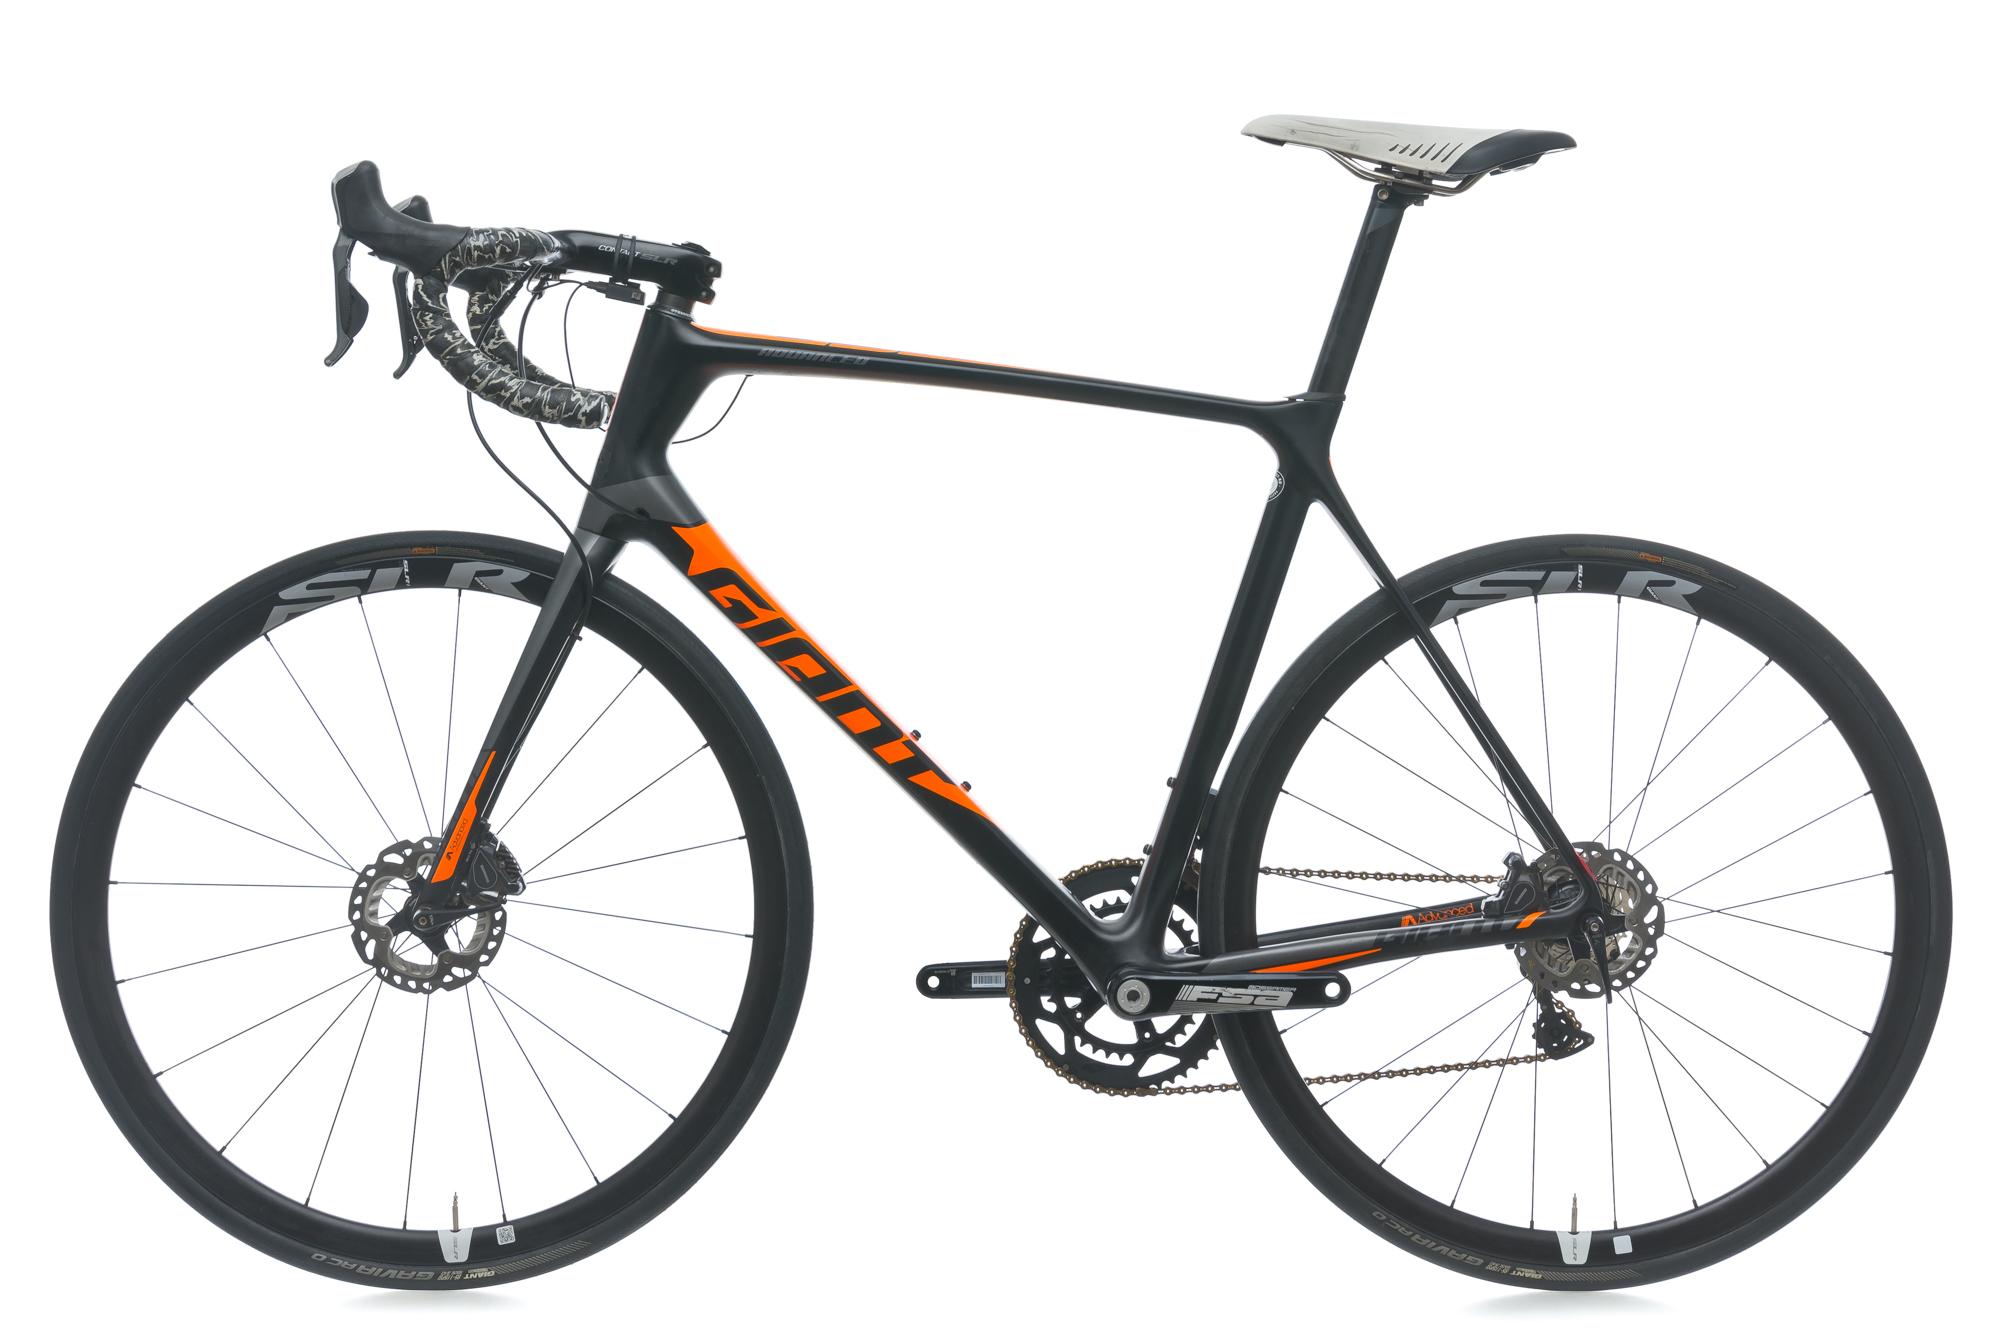 2017 Giant Tcr Advanced Pro Disc Road Bike 60cm X Large Carbon 700c Slr 3 M 2014 Wht Blue Shimano Di2